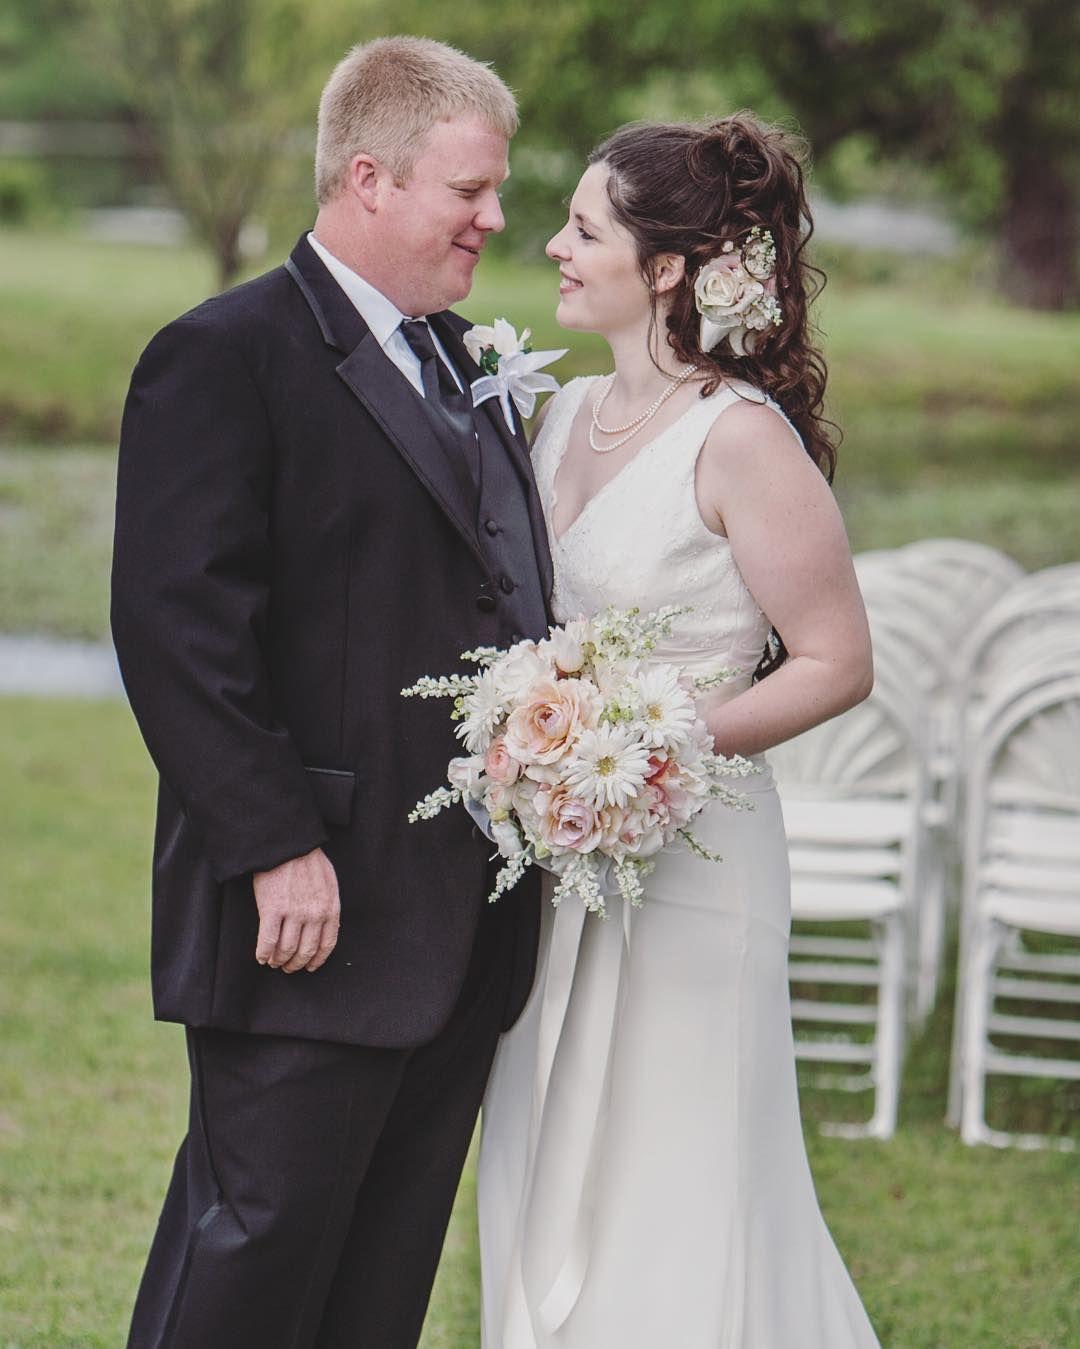 Wedding dresses tulsa  Bride and Groom barnsdall oklahoma tulsa bartlesville wedding